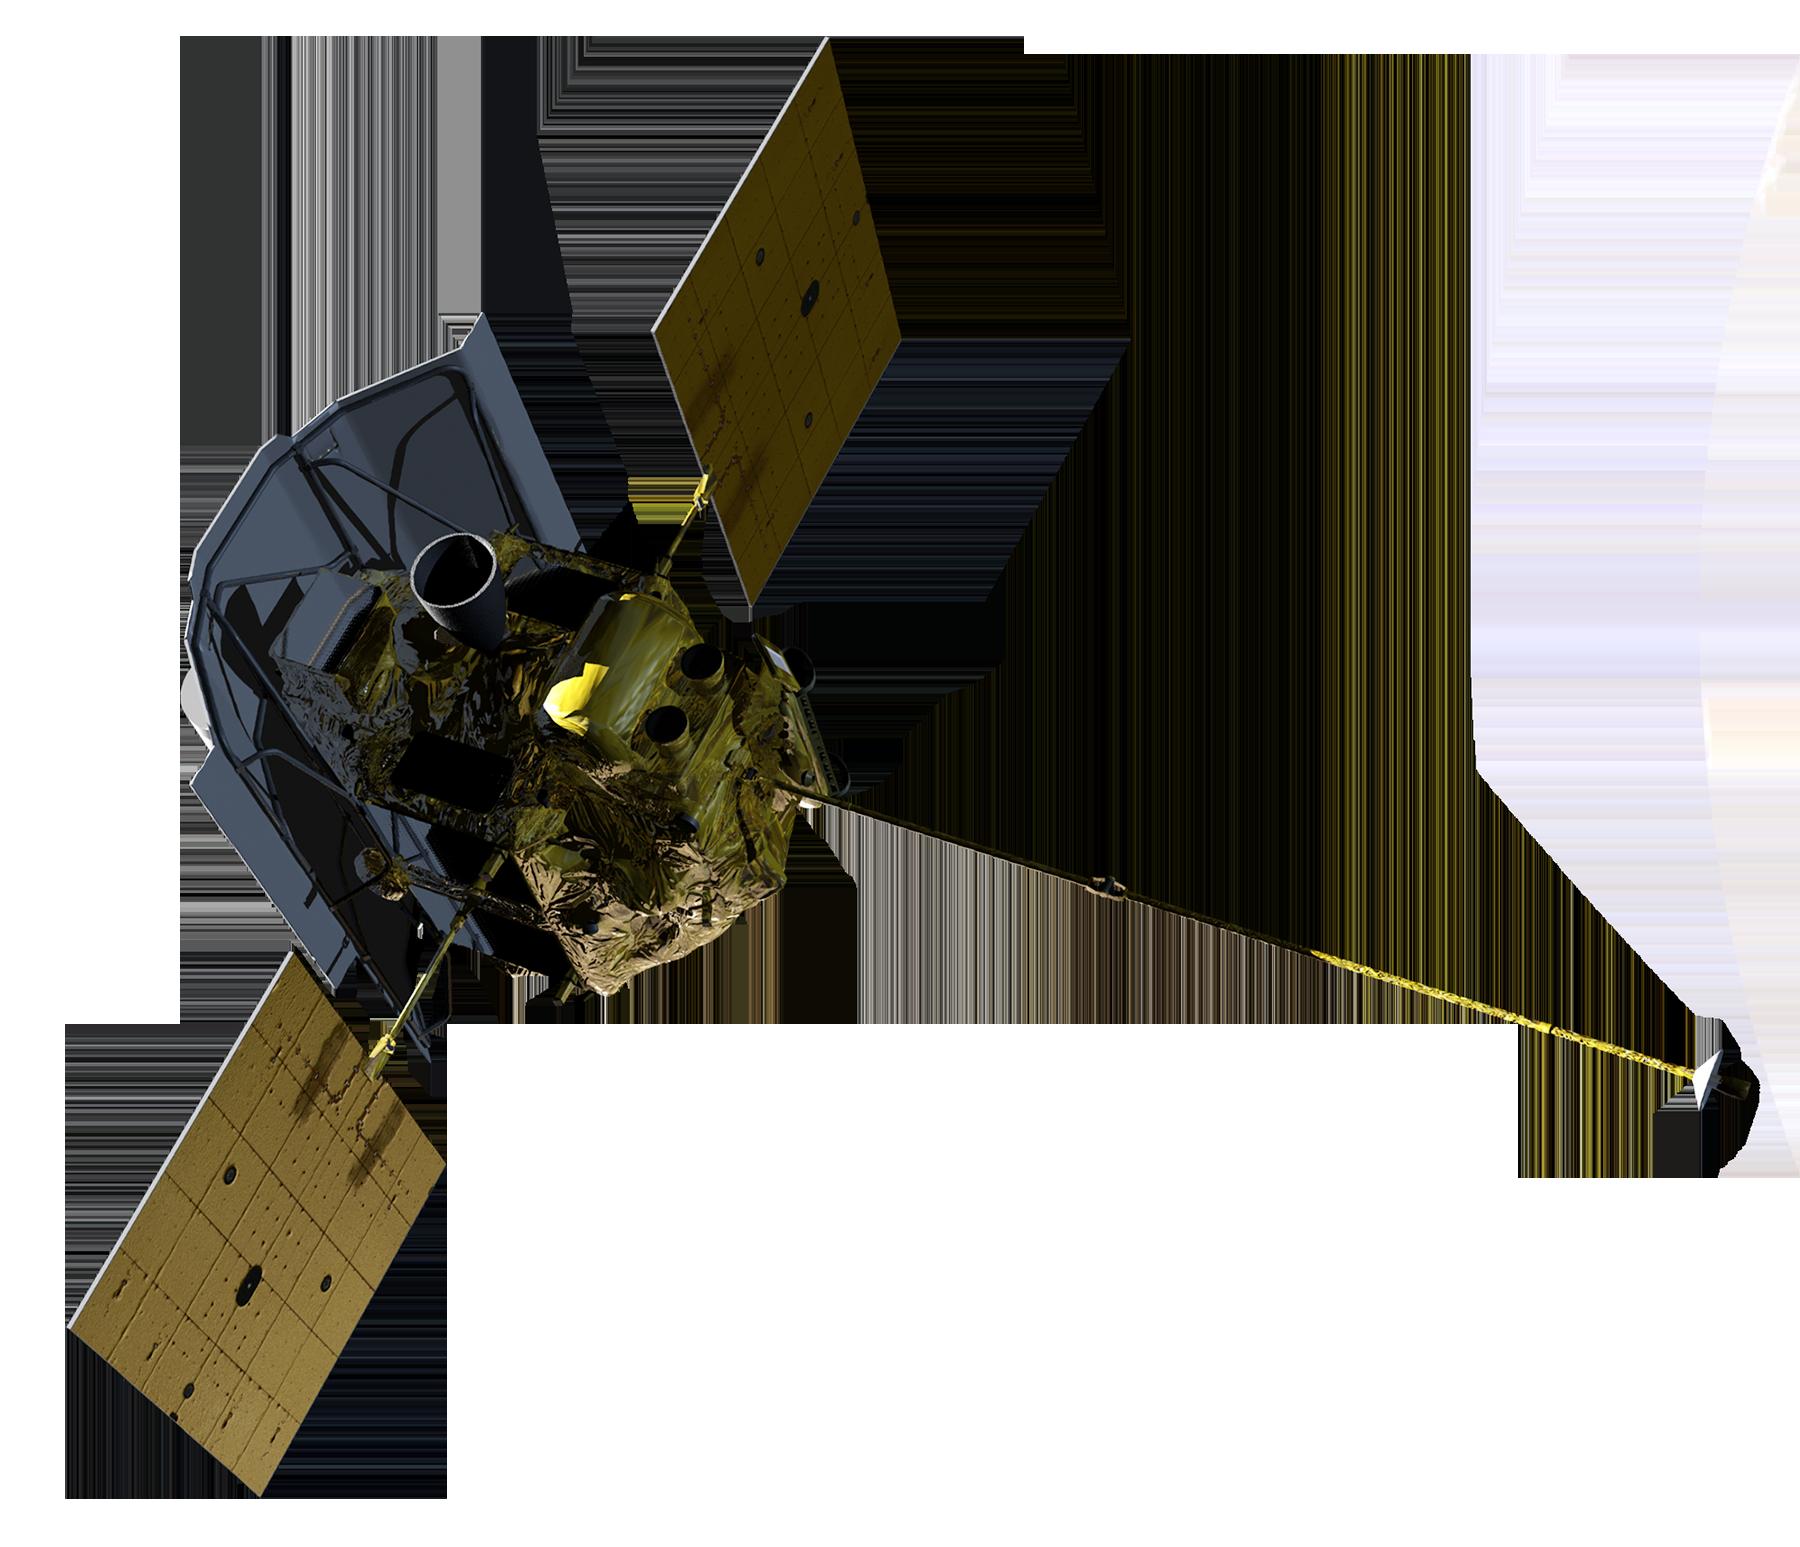 messenger space probe - photo #24